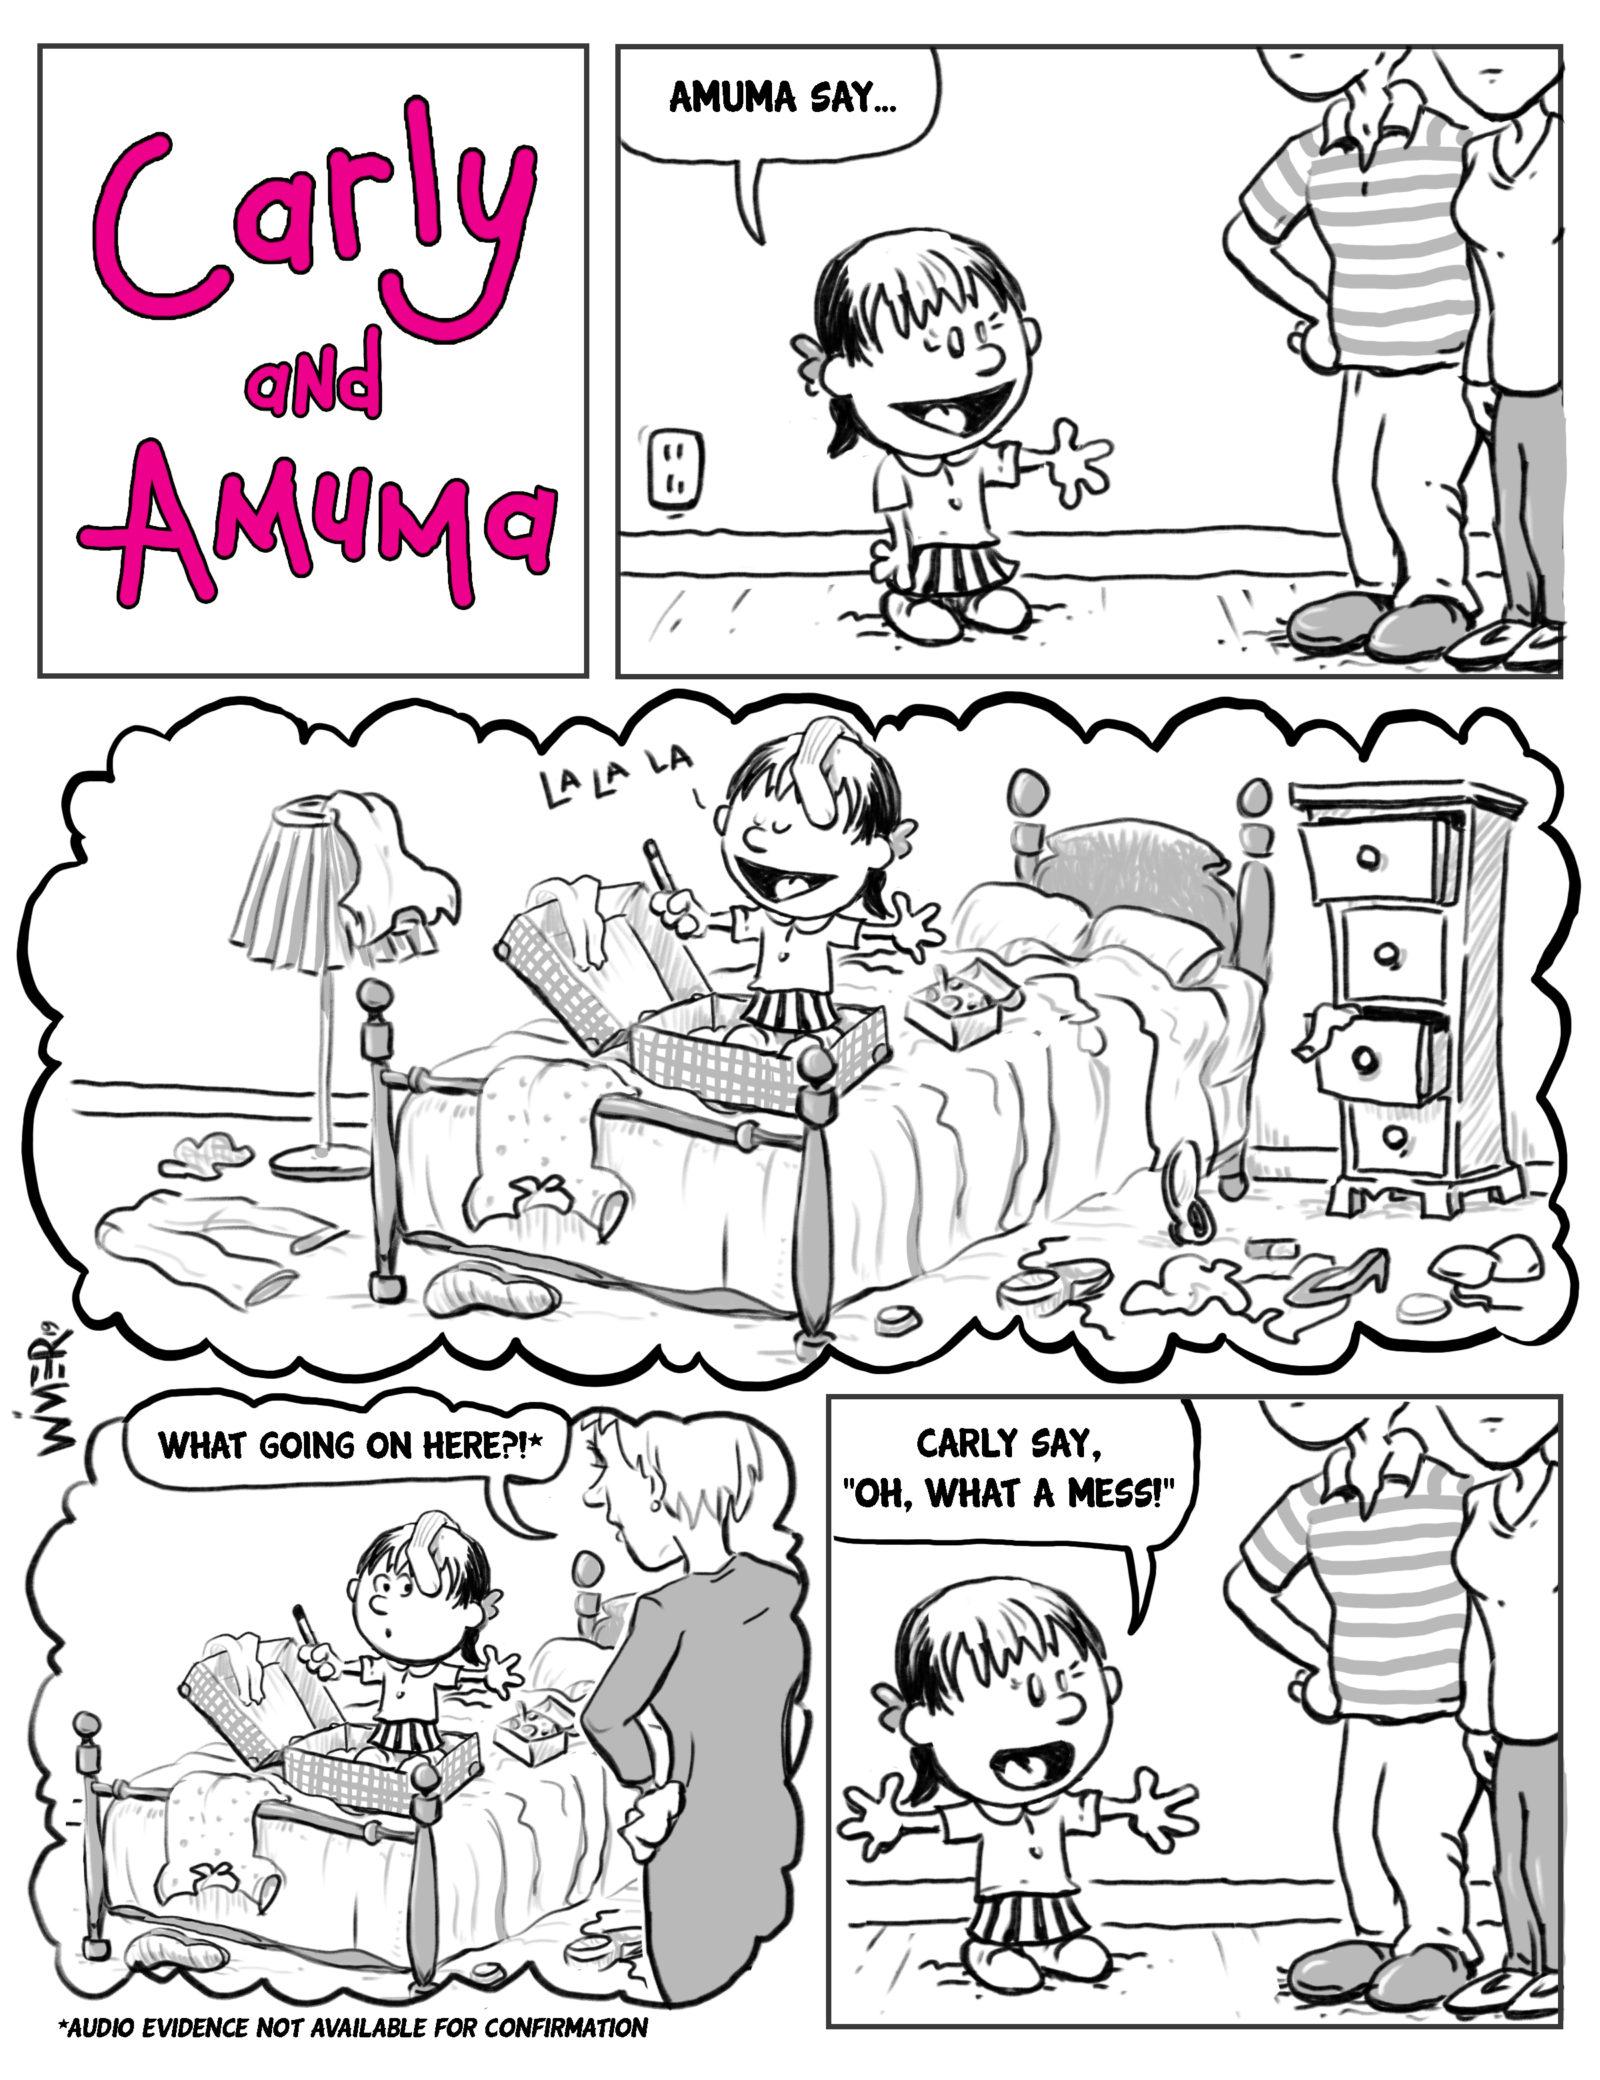 carly and amuma